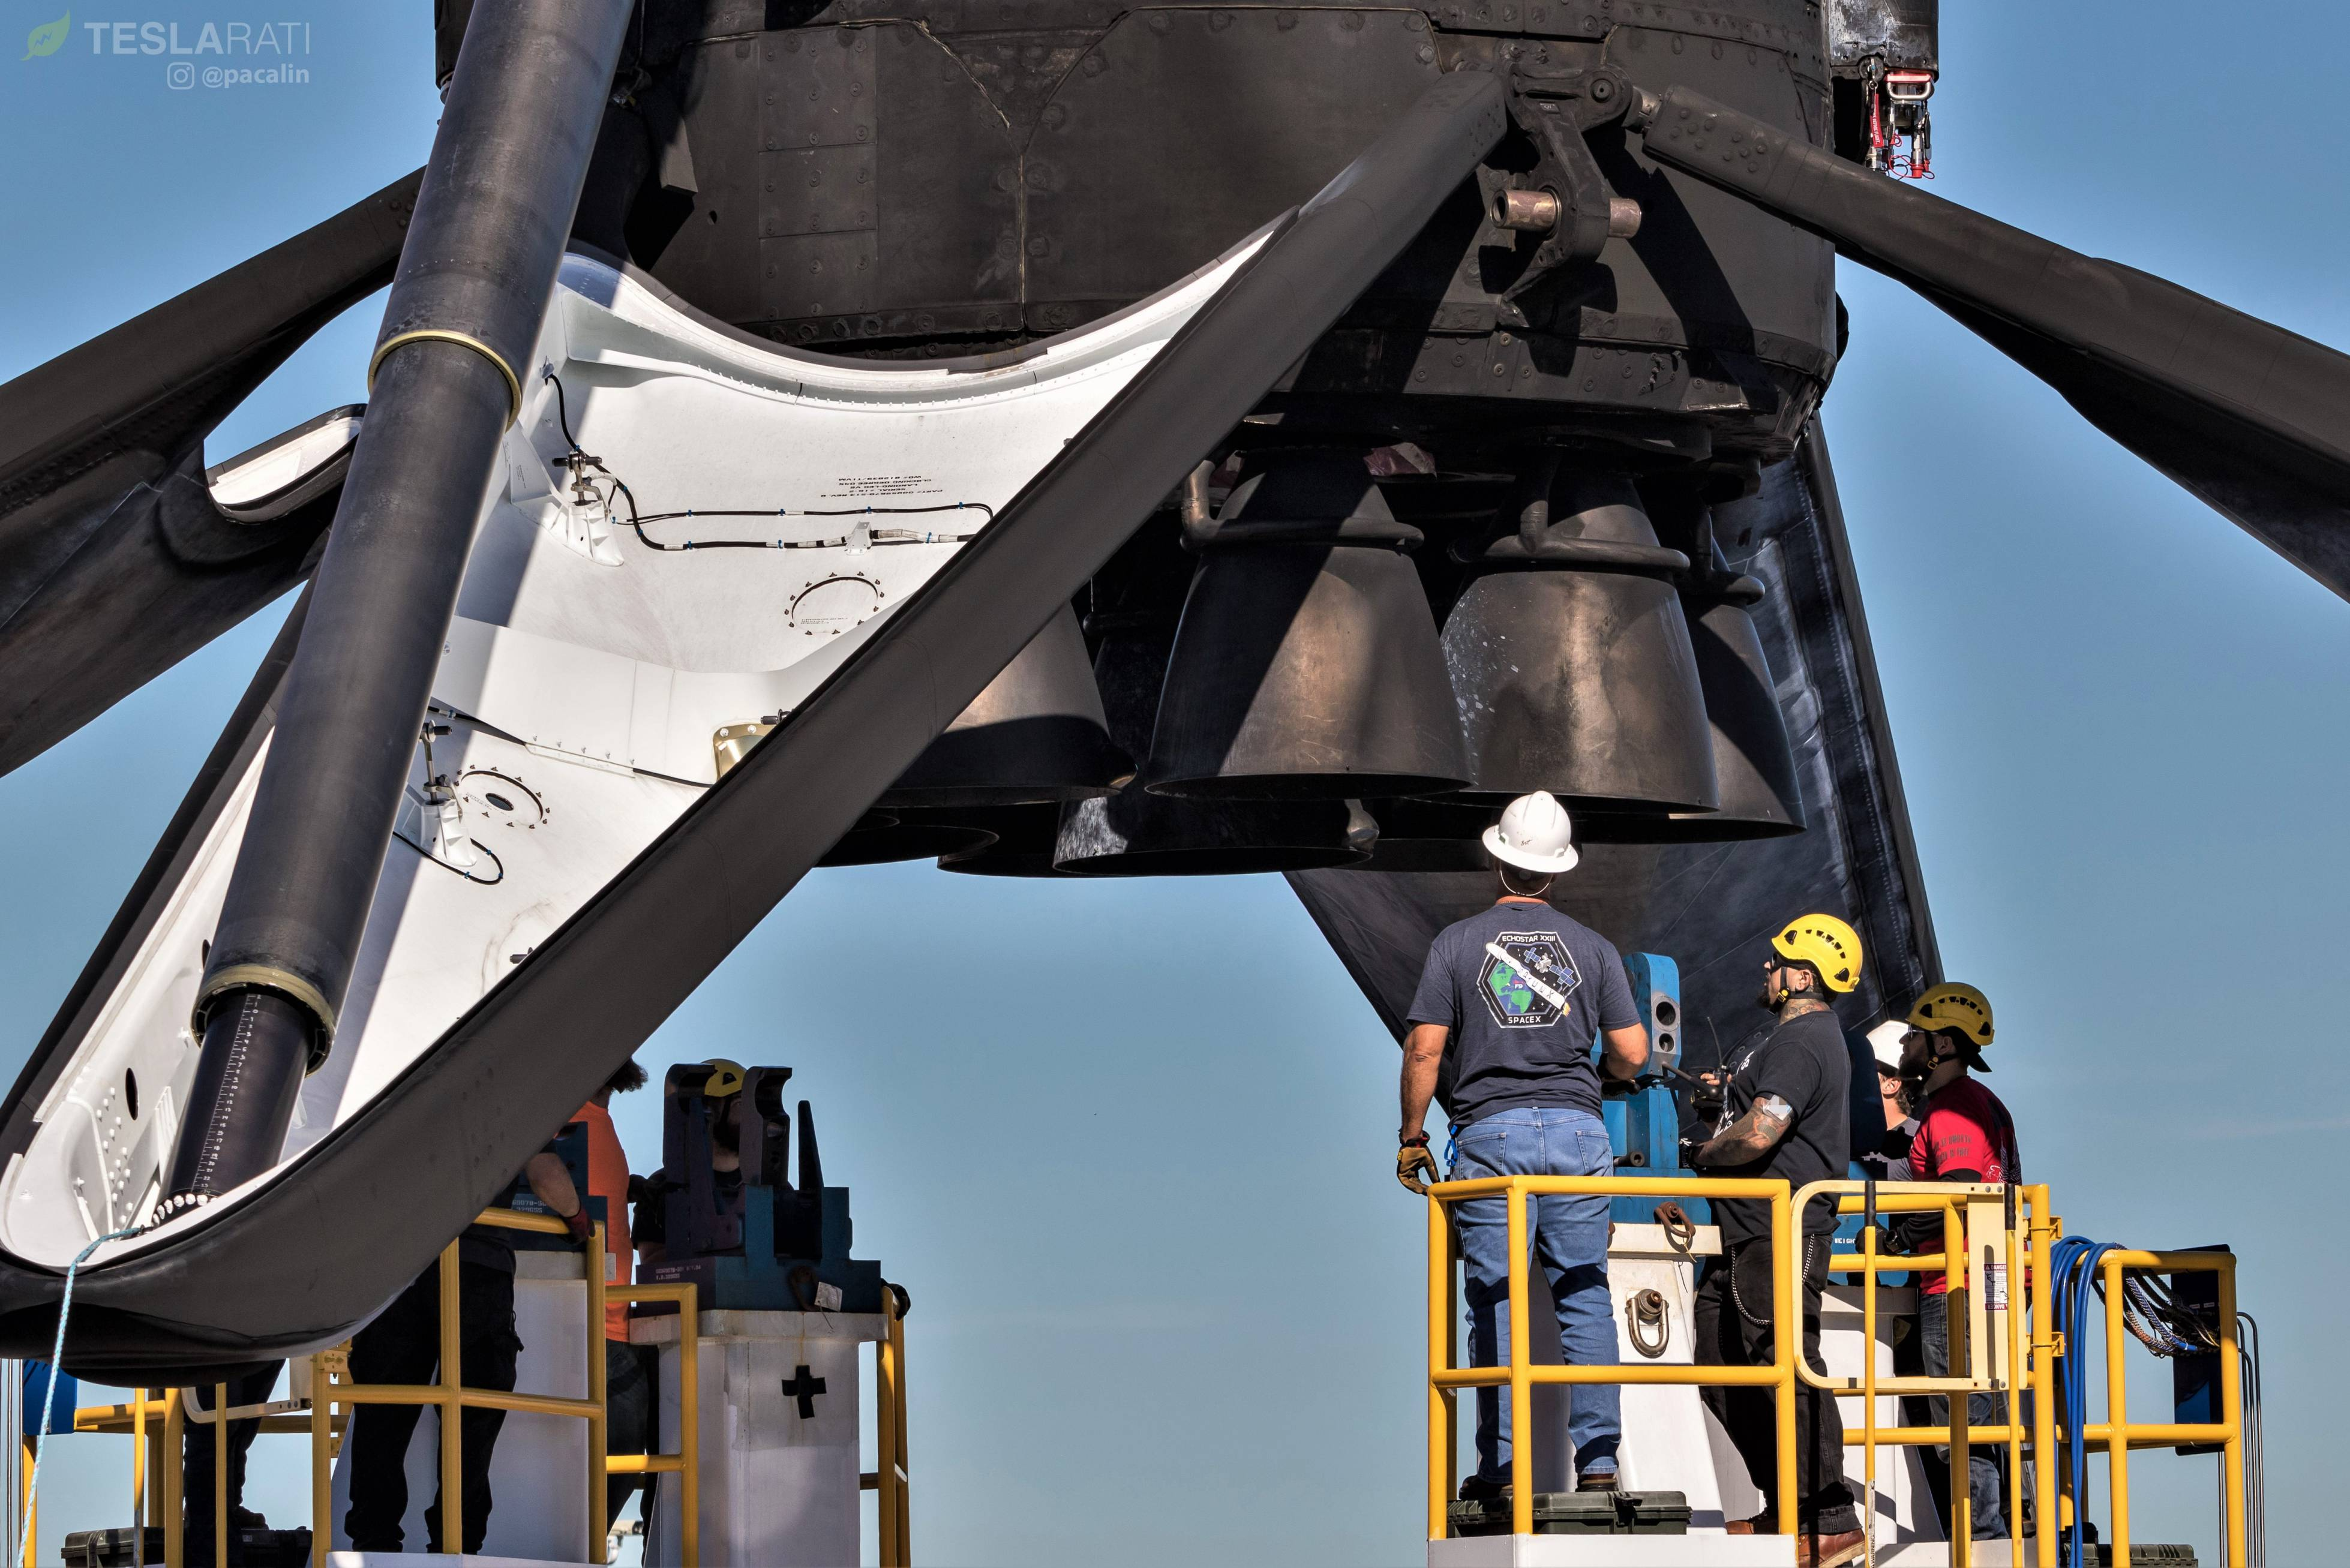 Falcon 9 B1046 SSO-A Merlins + legs 120718 (Pauline Acalin) (11)(c)